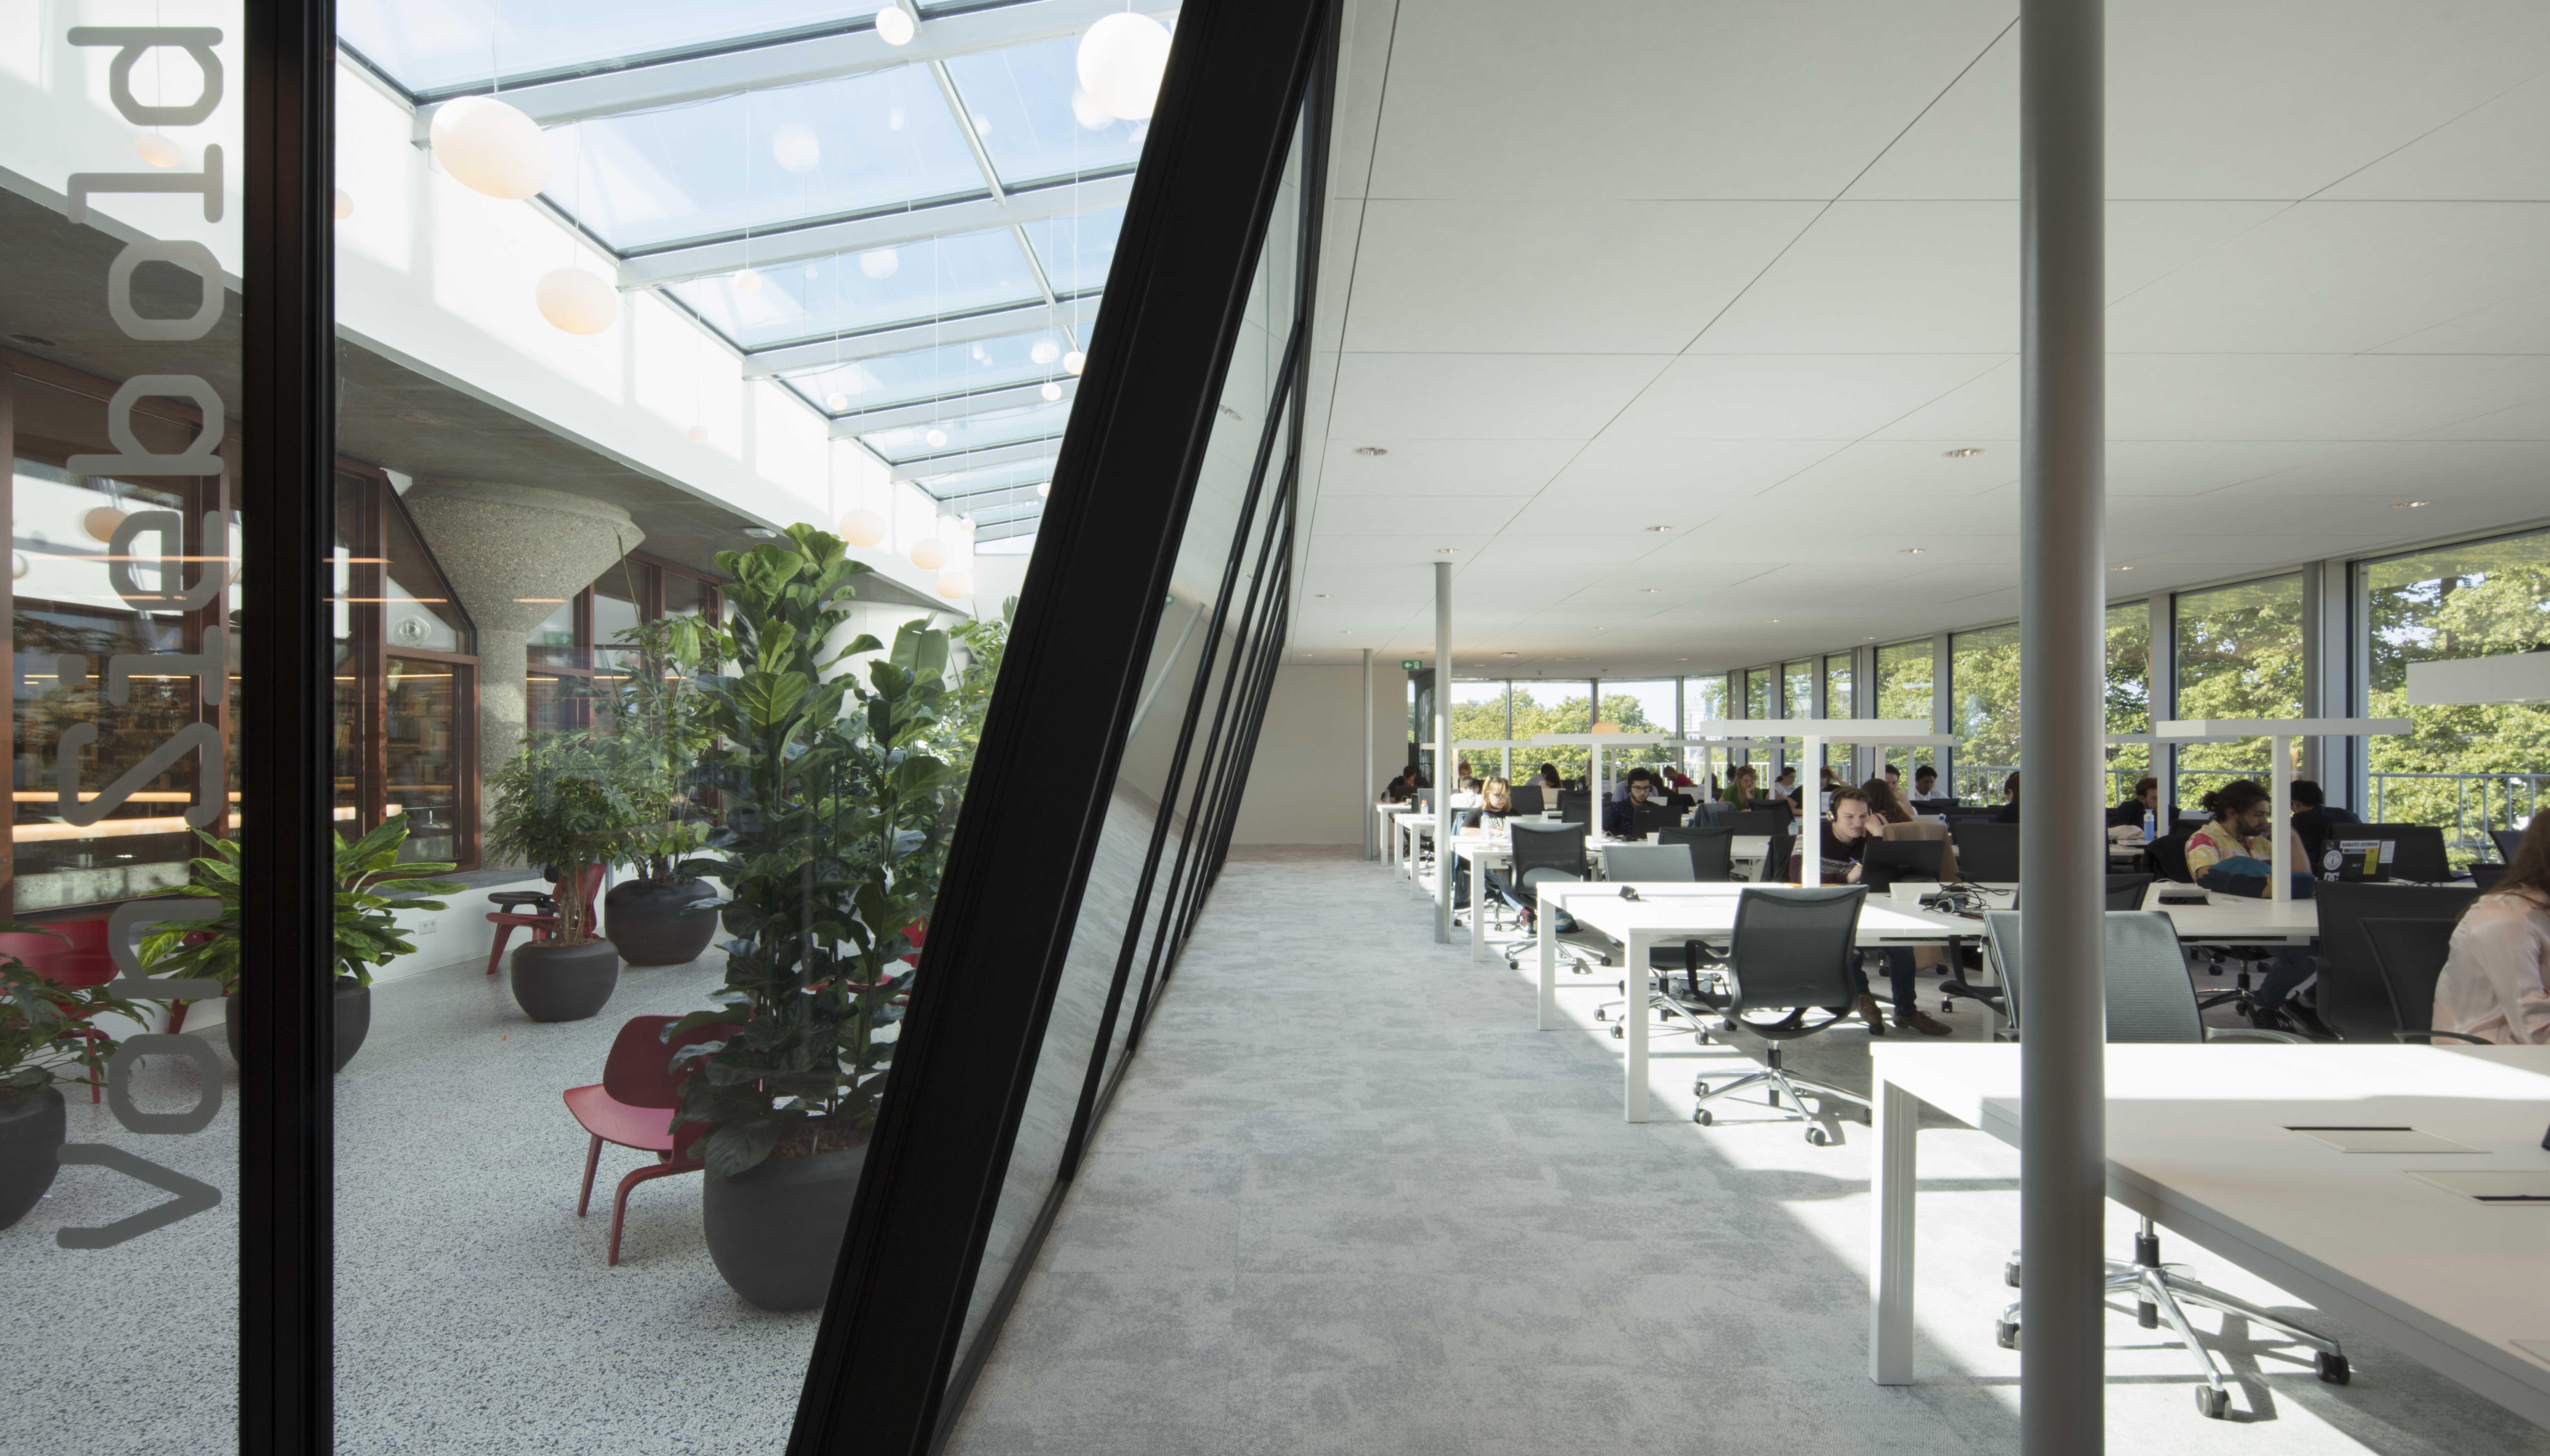 <p>Serre en werkplekken in de Asian Library universiteitsbibliotheek Leiden. foto: Jeroen Musch</p>